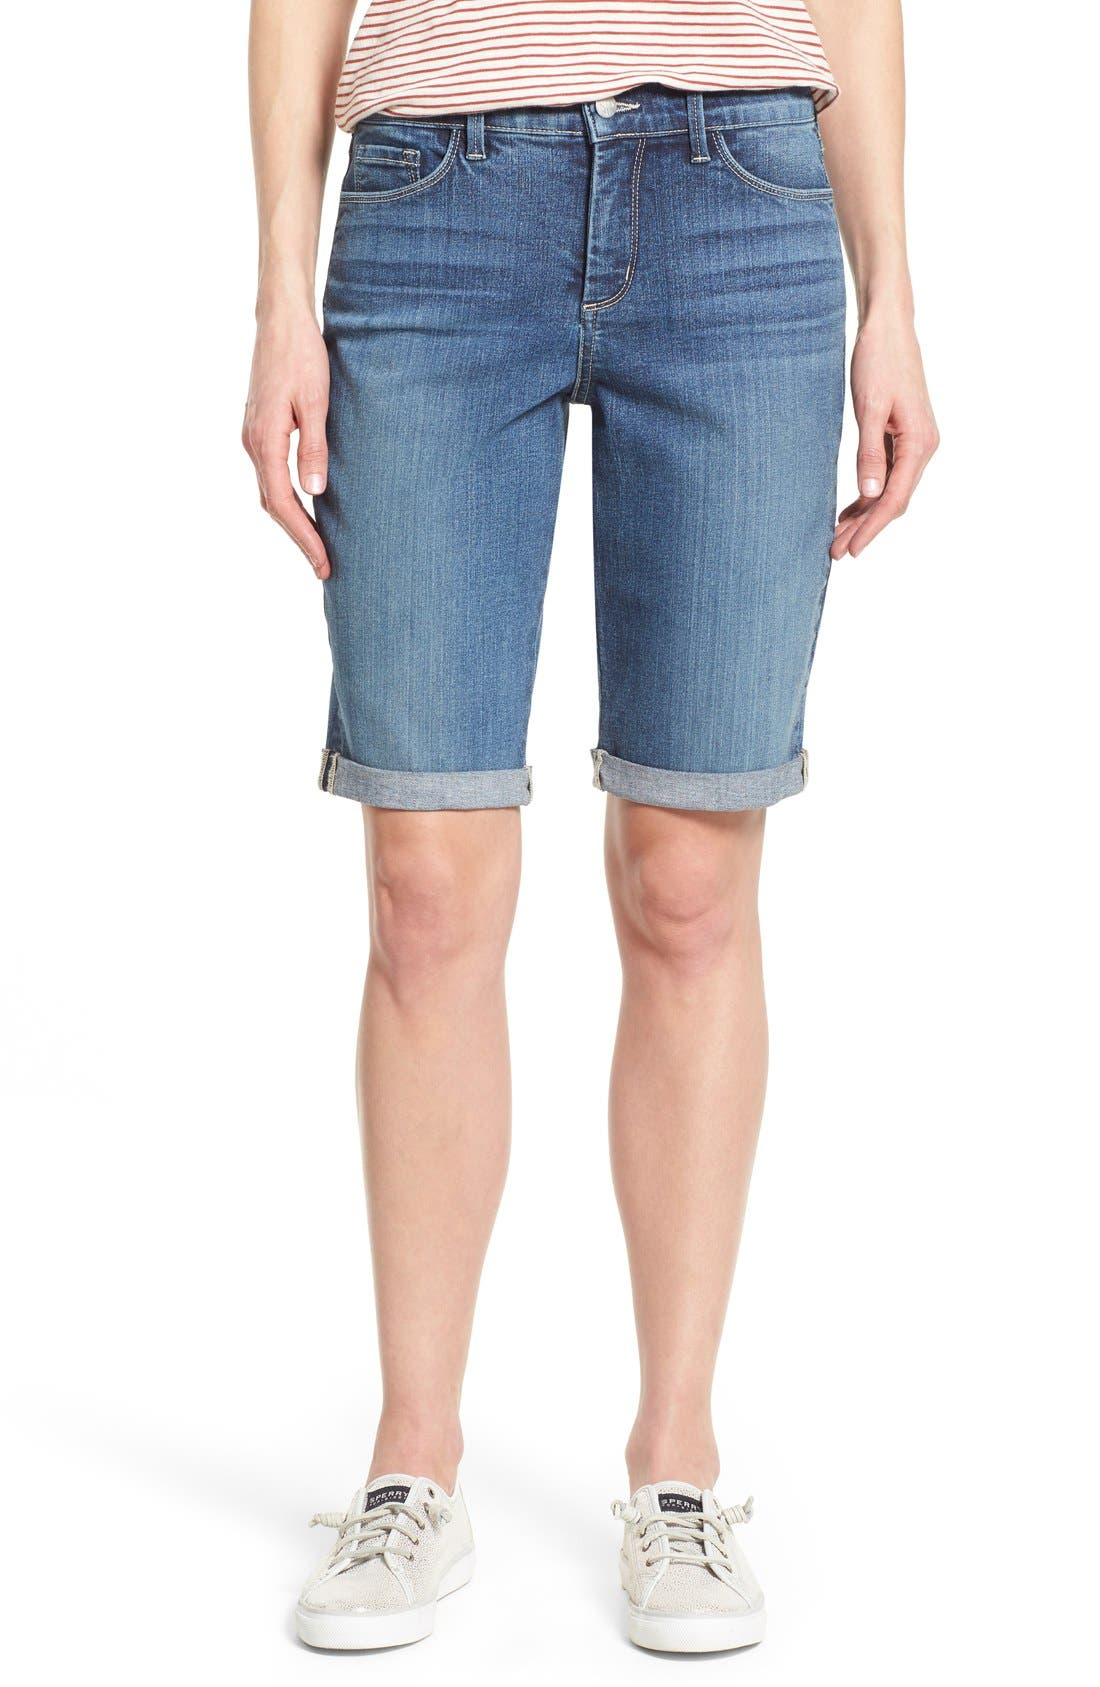 Alternate Image 1 Selected - NYDJ Briella Roll Cuff Stretch Denim Shorts (Heyburn) (Regular & Petite)